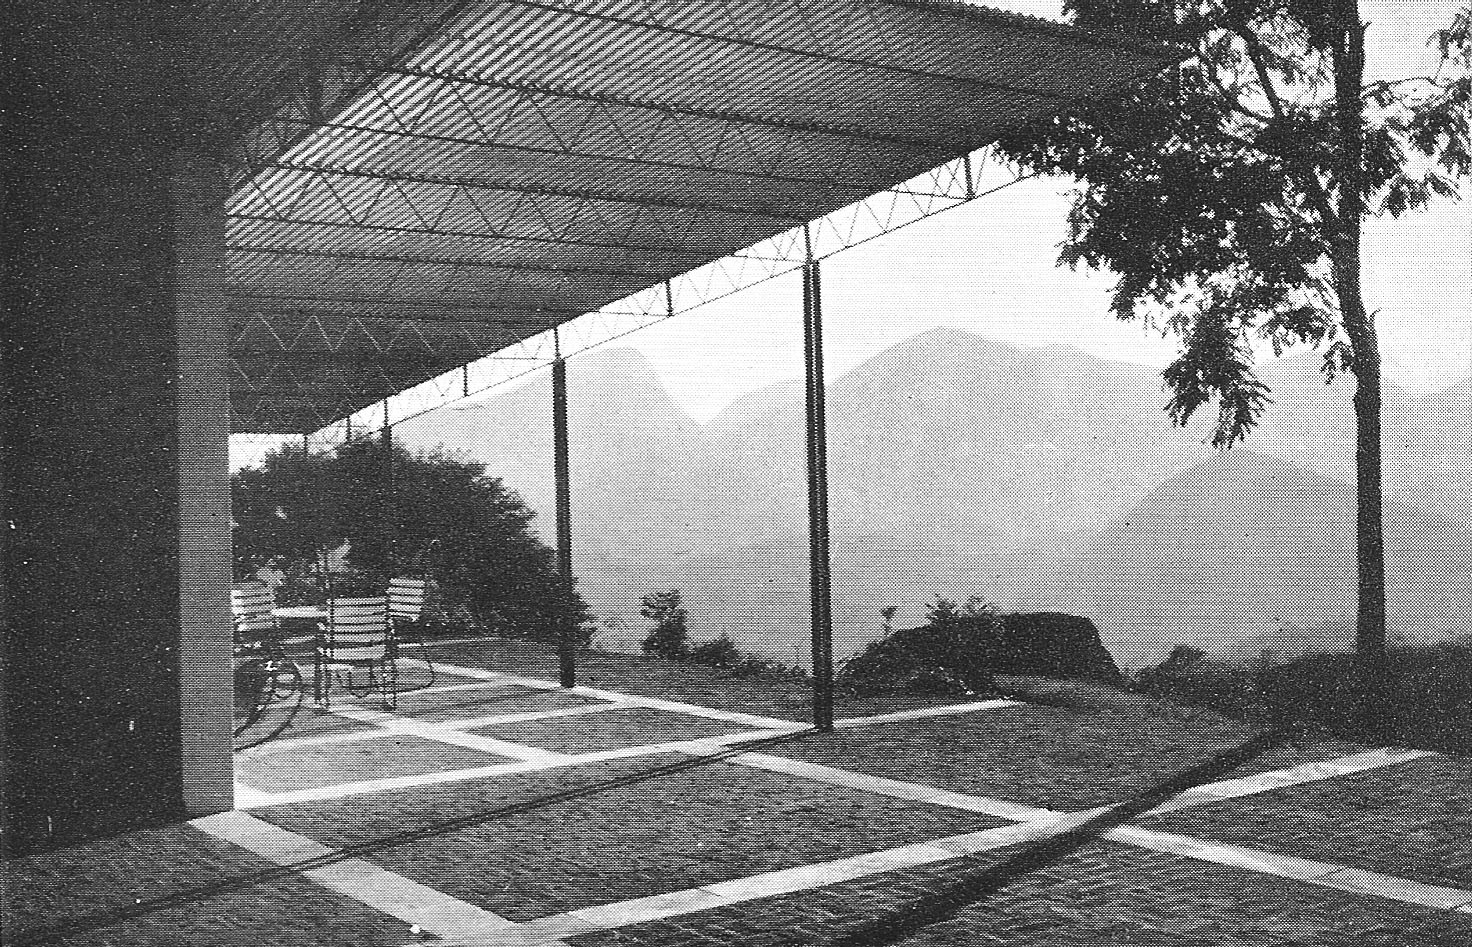 Clásicos de Arquitectura: Casa Lota de Macedo Soares / Sérgio Bernardes, © AA, n. 90